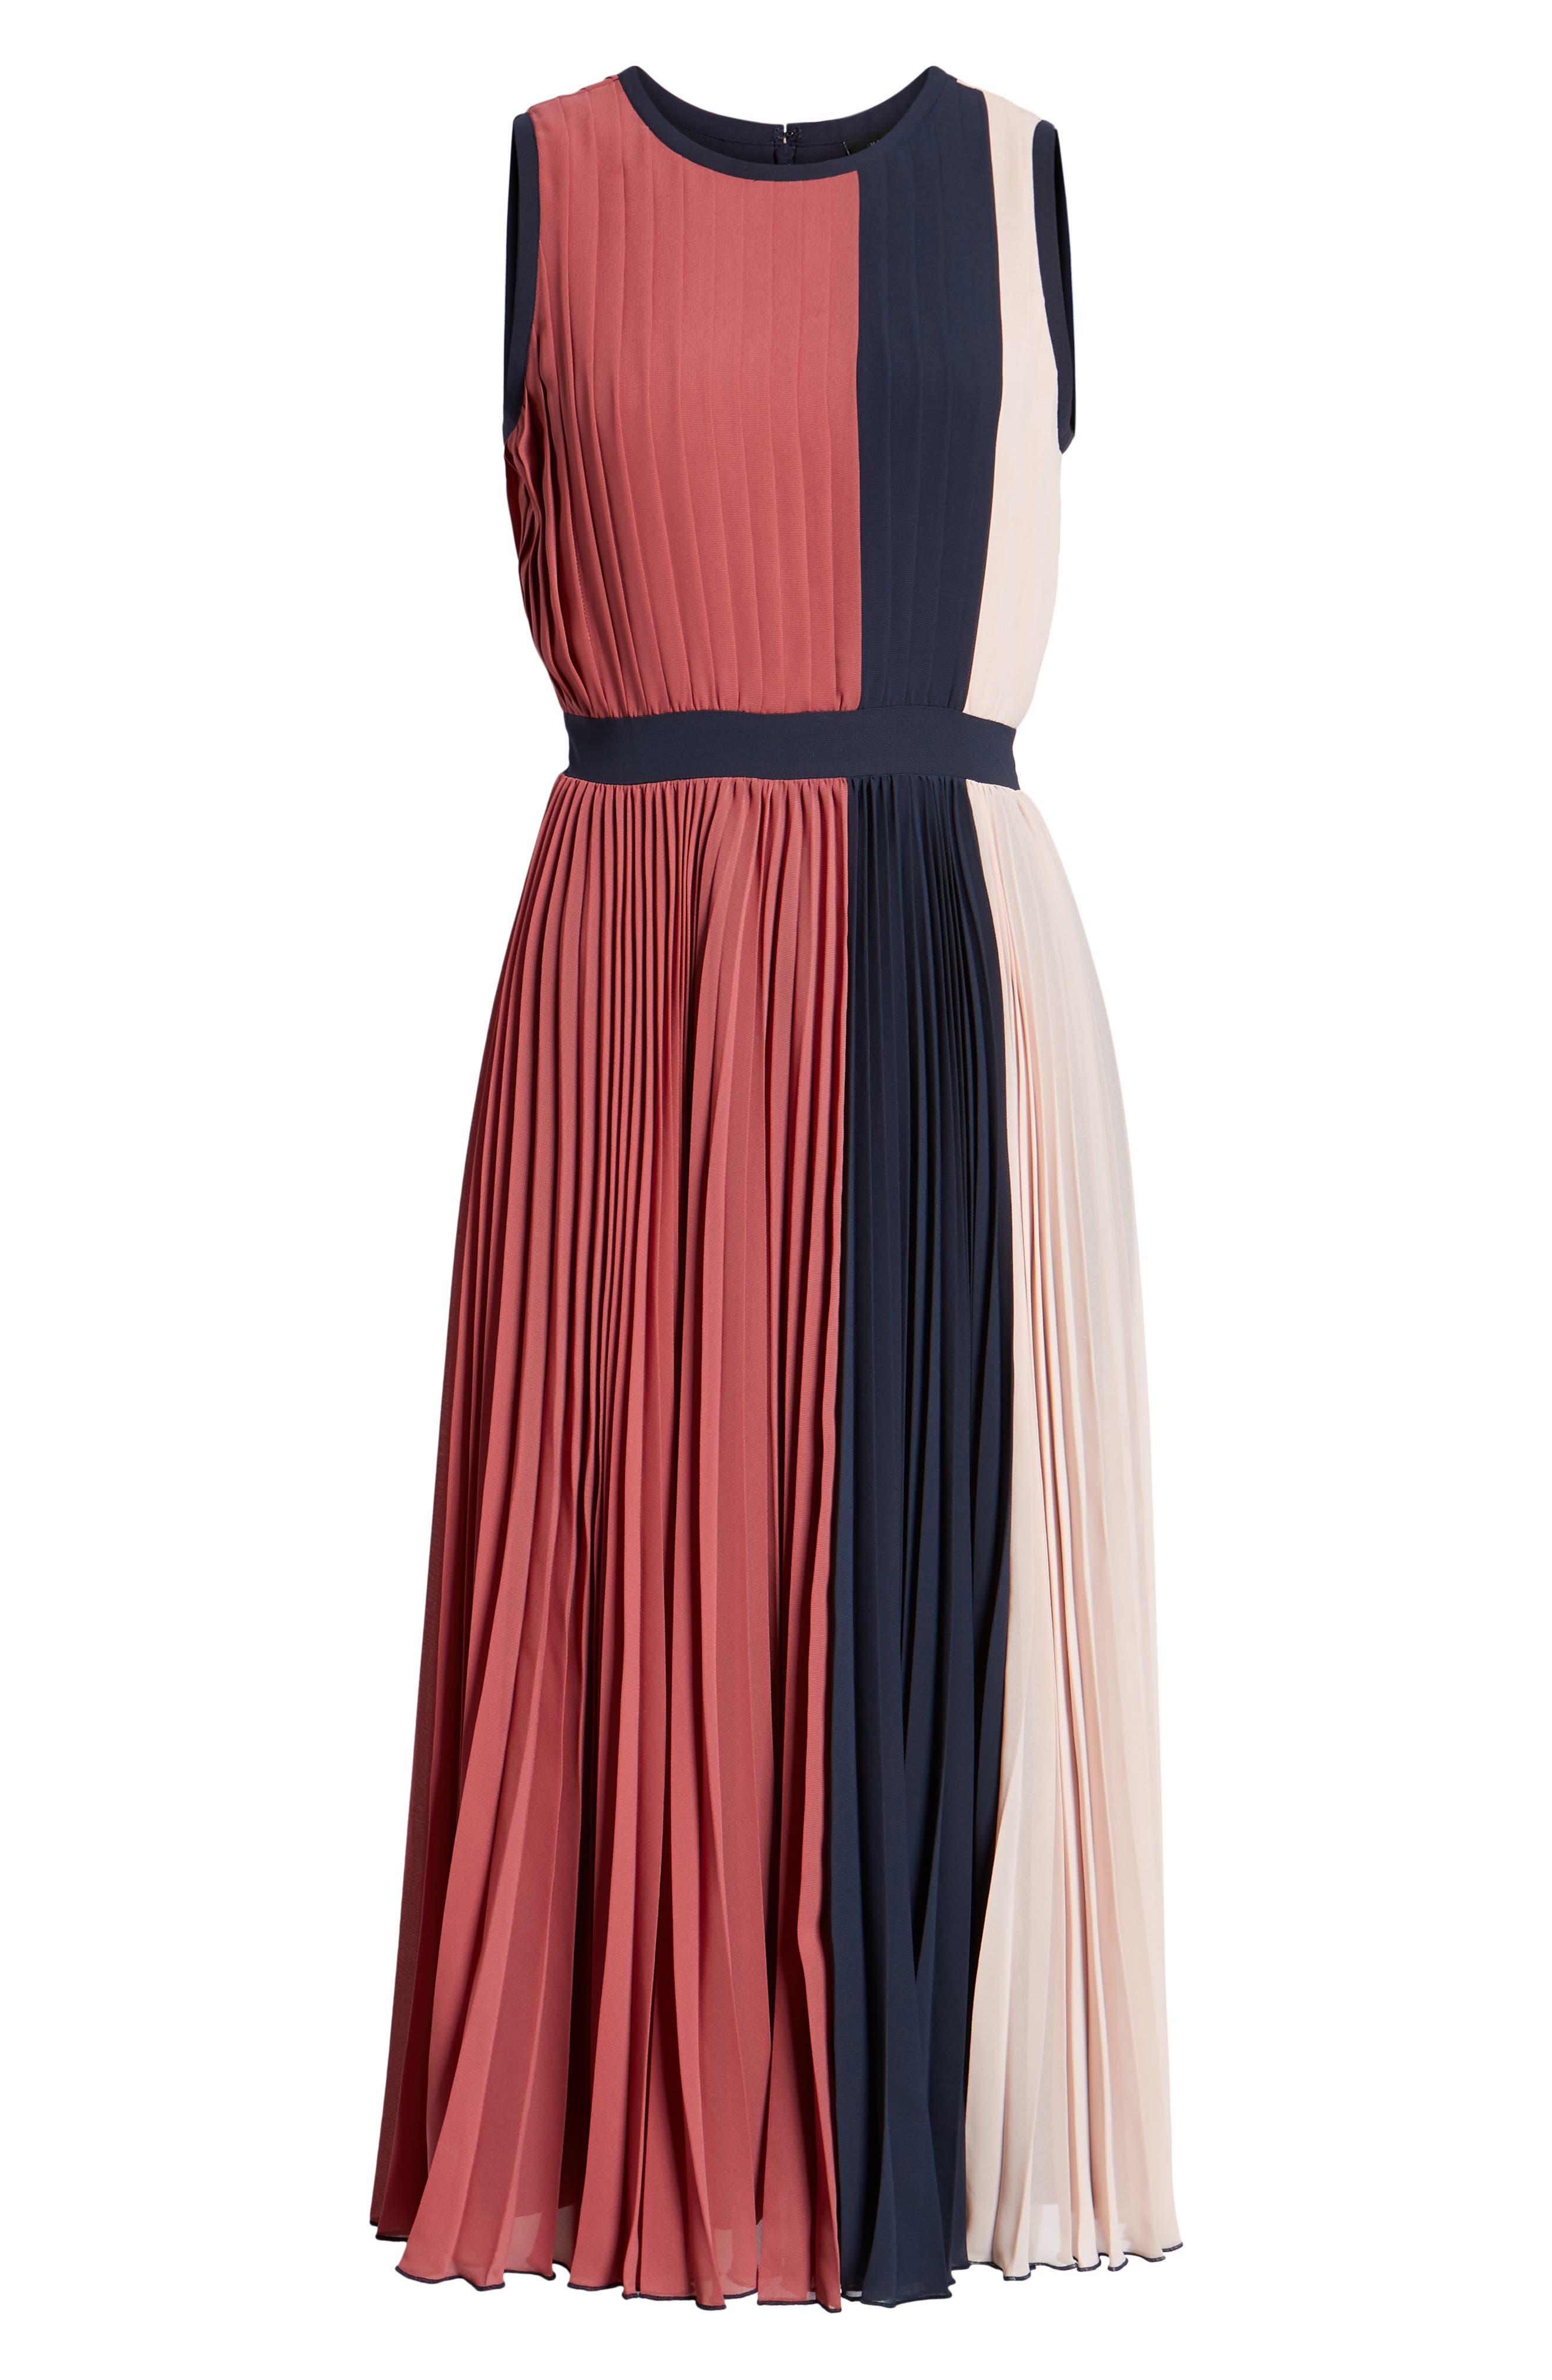 x Atlantic-Pacific Colorblock Pleated Midi Dress,                             Alternate thumbnail 7, color,                             PINK- NAVY COLORBLOCK